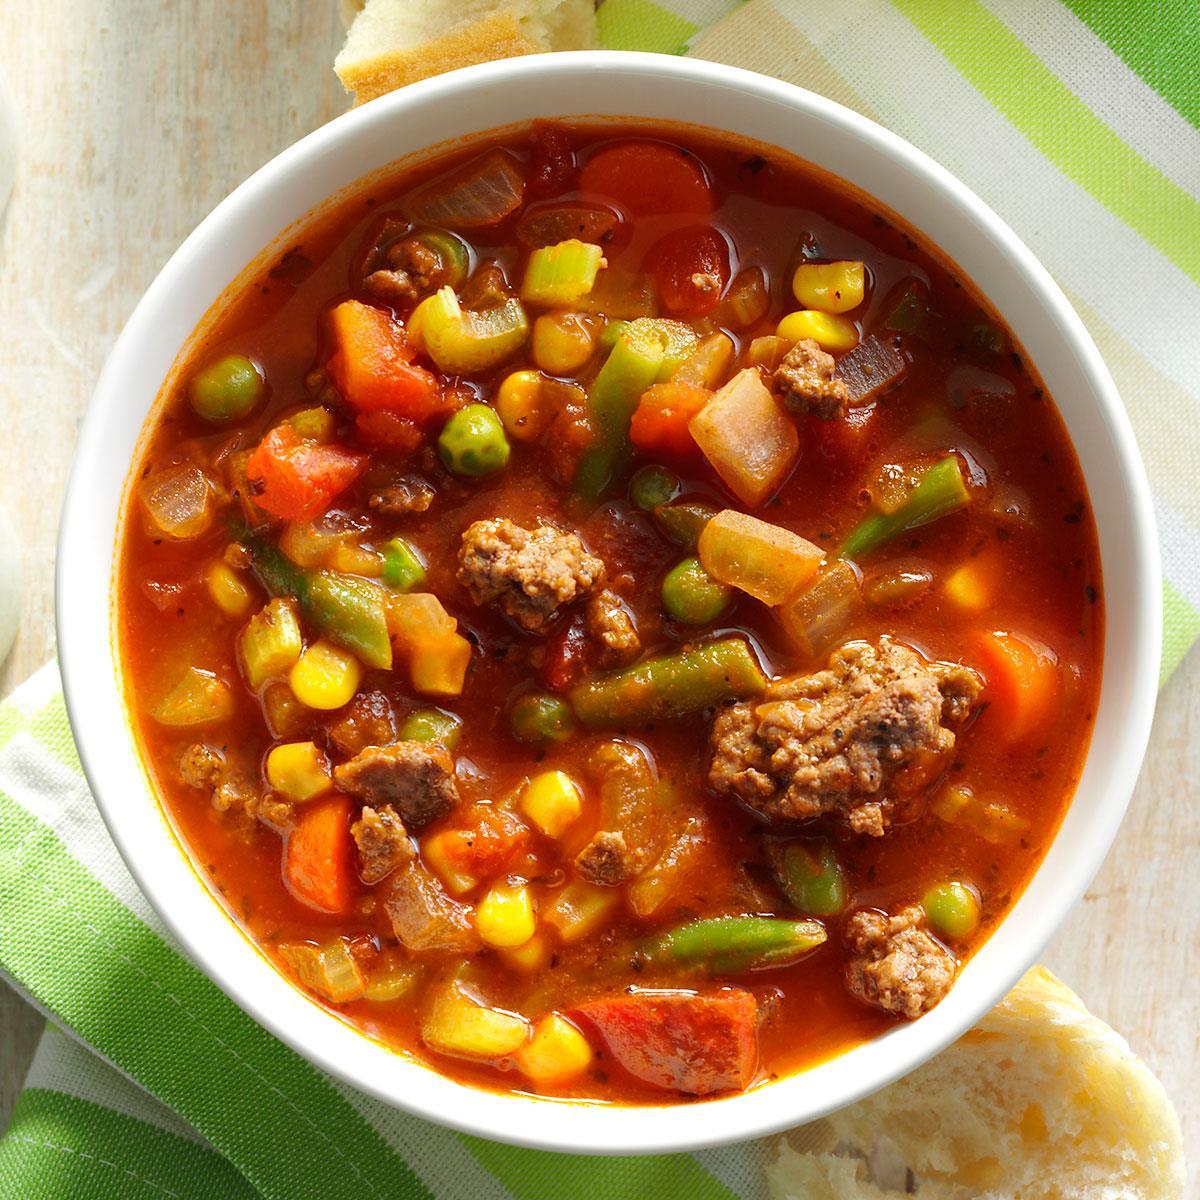 Spicy Beef Vegetable Stew Recipe